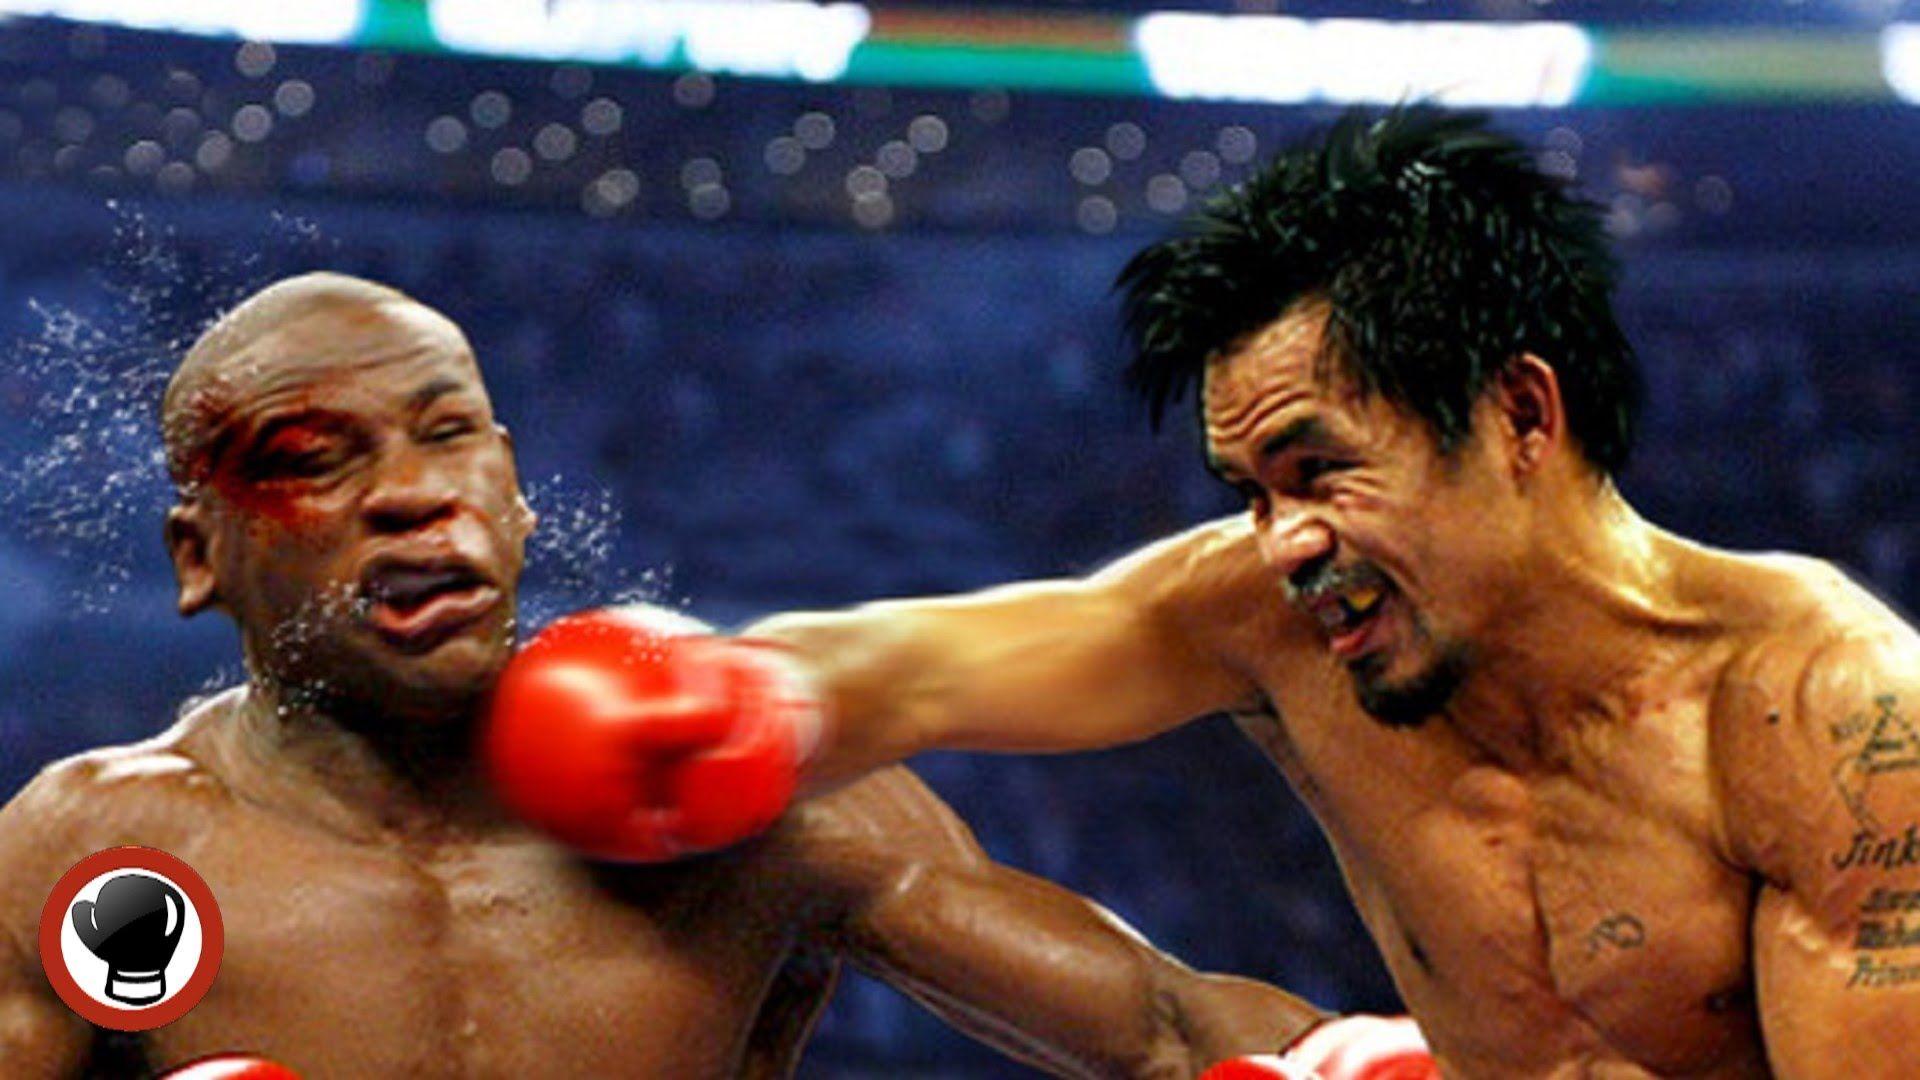 Manny Pacquiao Vs Floyd Mayweather Google Search Pacquiao Vs Floyd Mayweather Manny Pacquiao